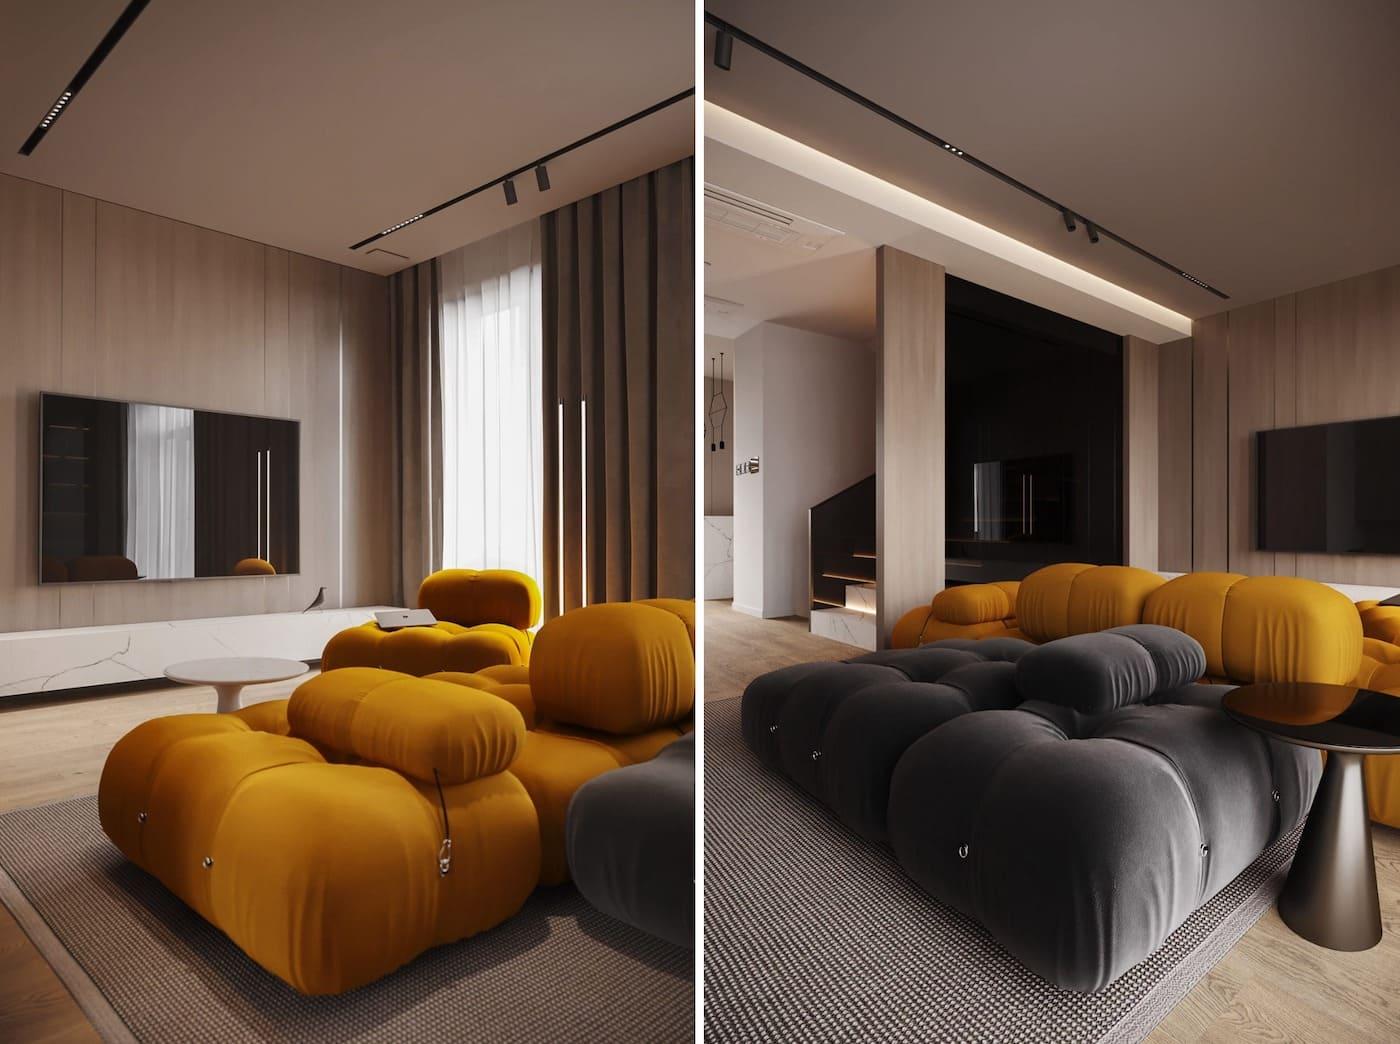 дизайн интерьера модной квартиры фото 4